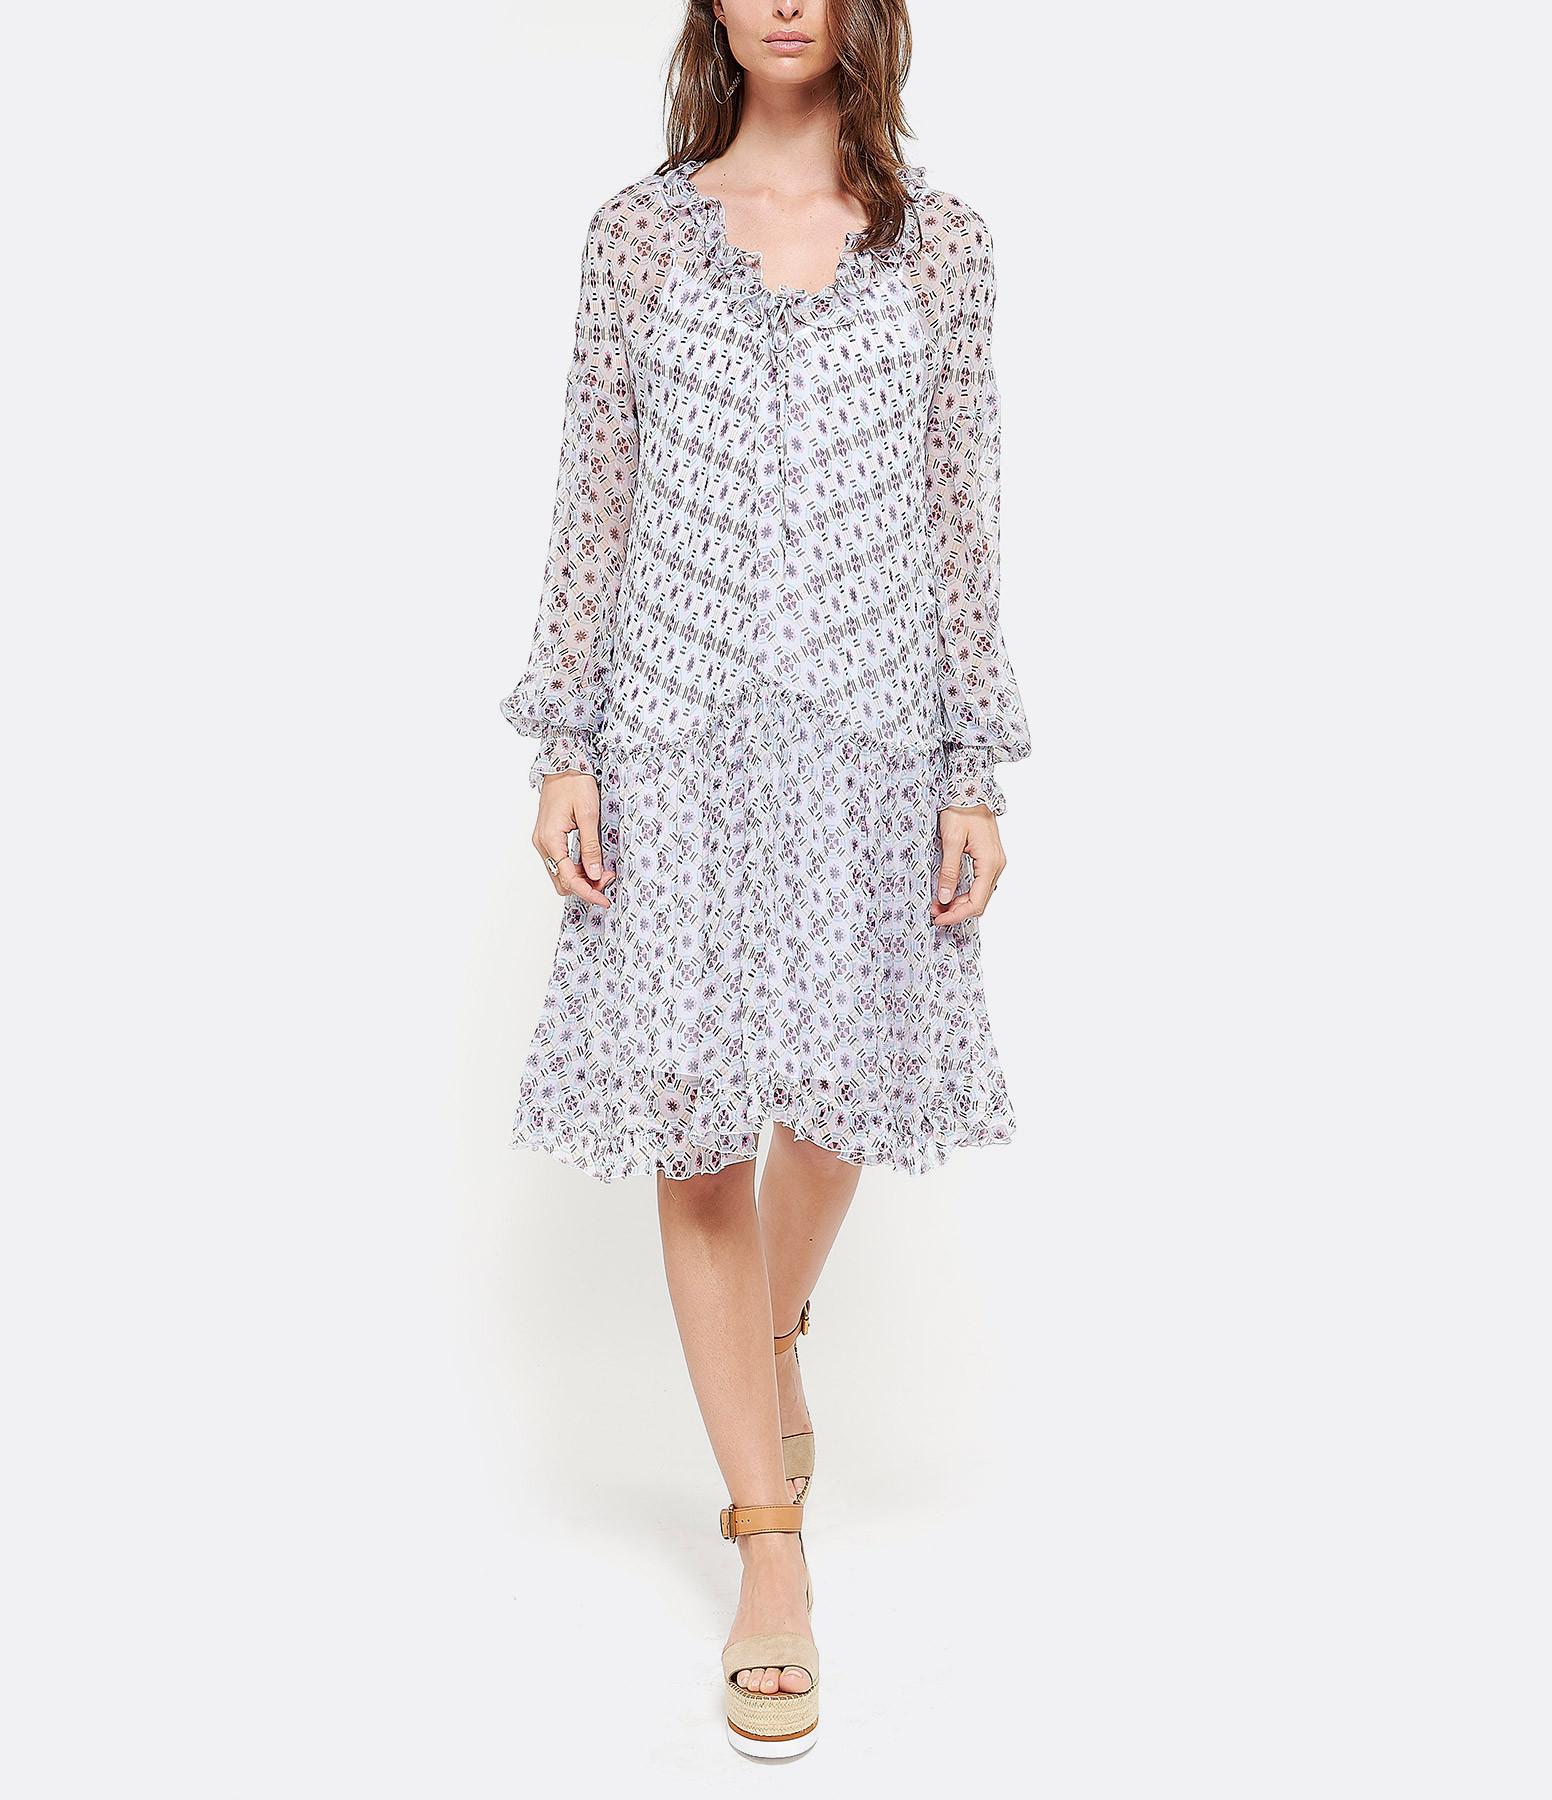 SEE BY CHLOE - Robe Transparente Soie Imprimé Blanc